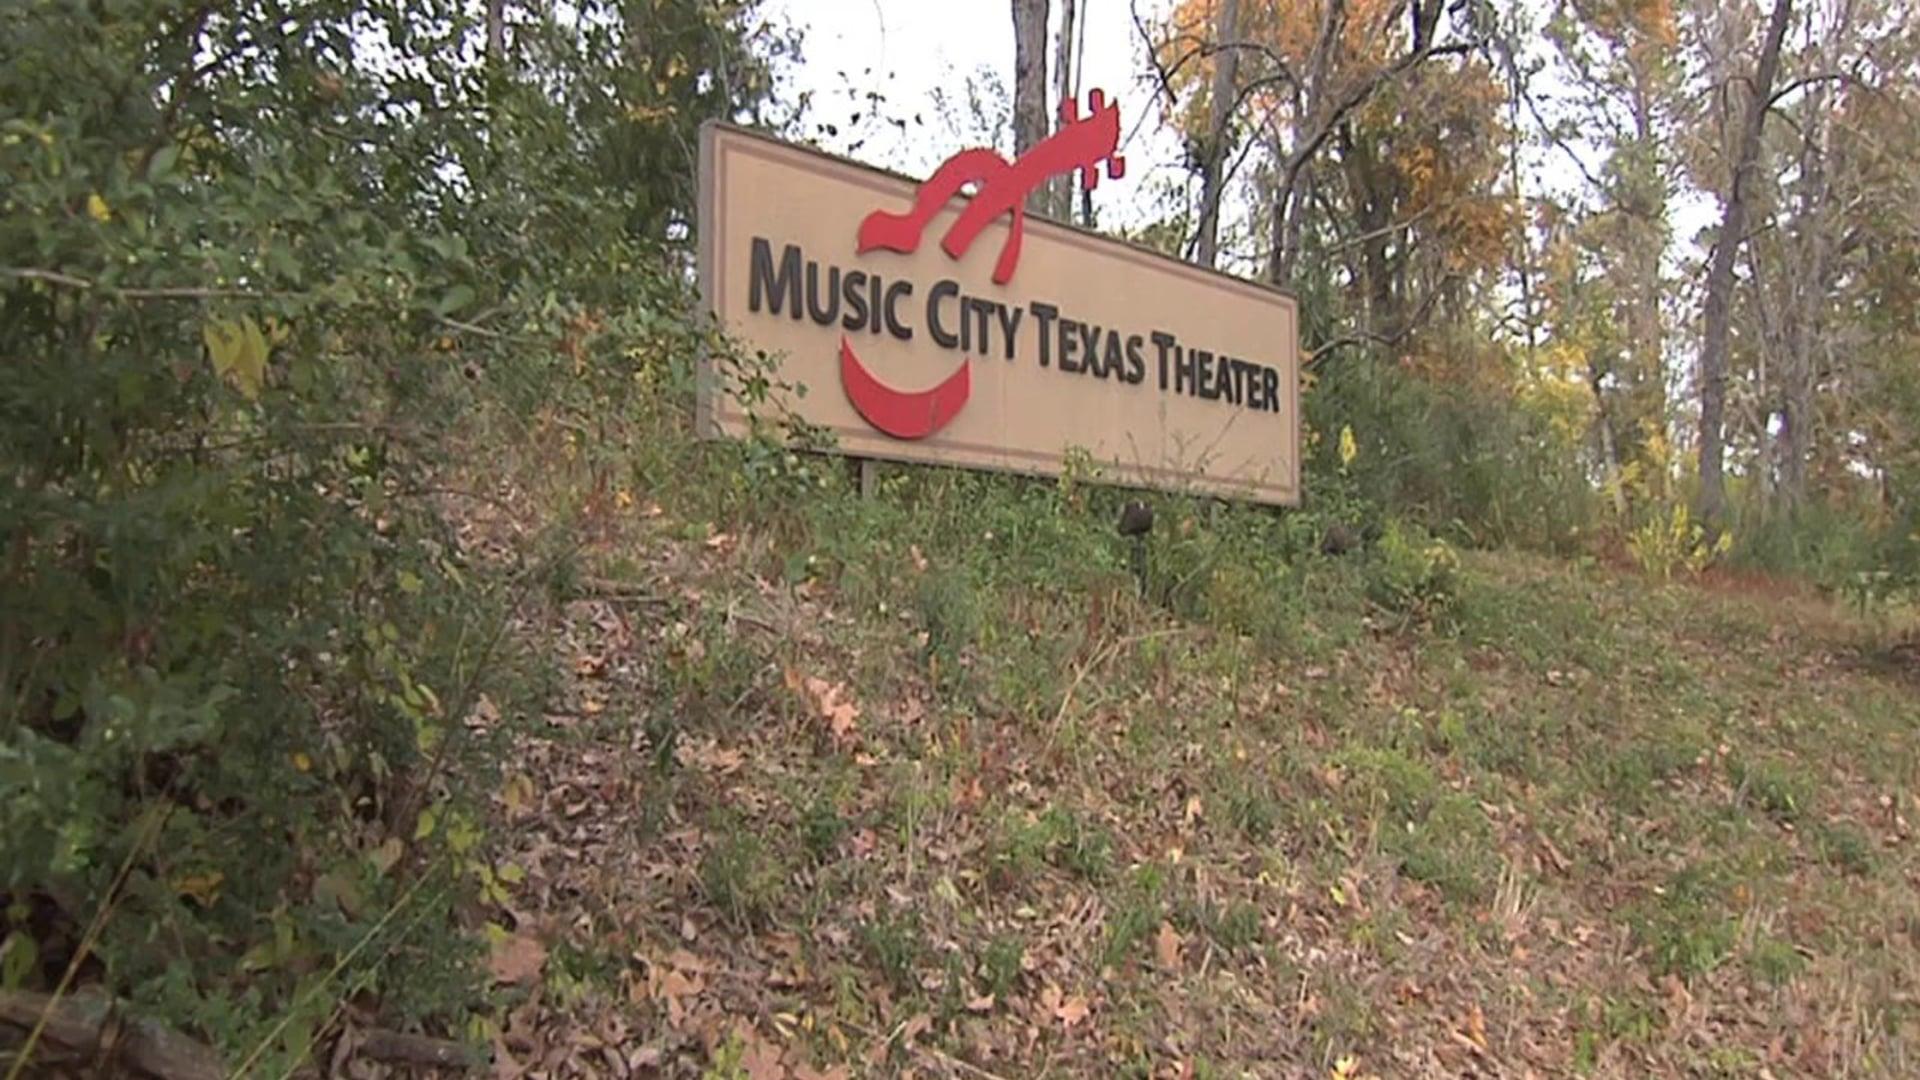 Music City Texas Theater video